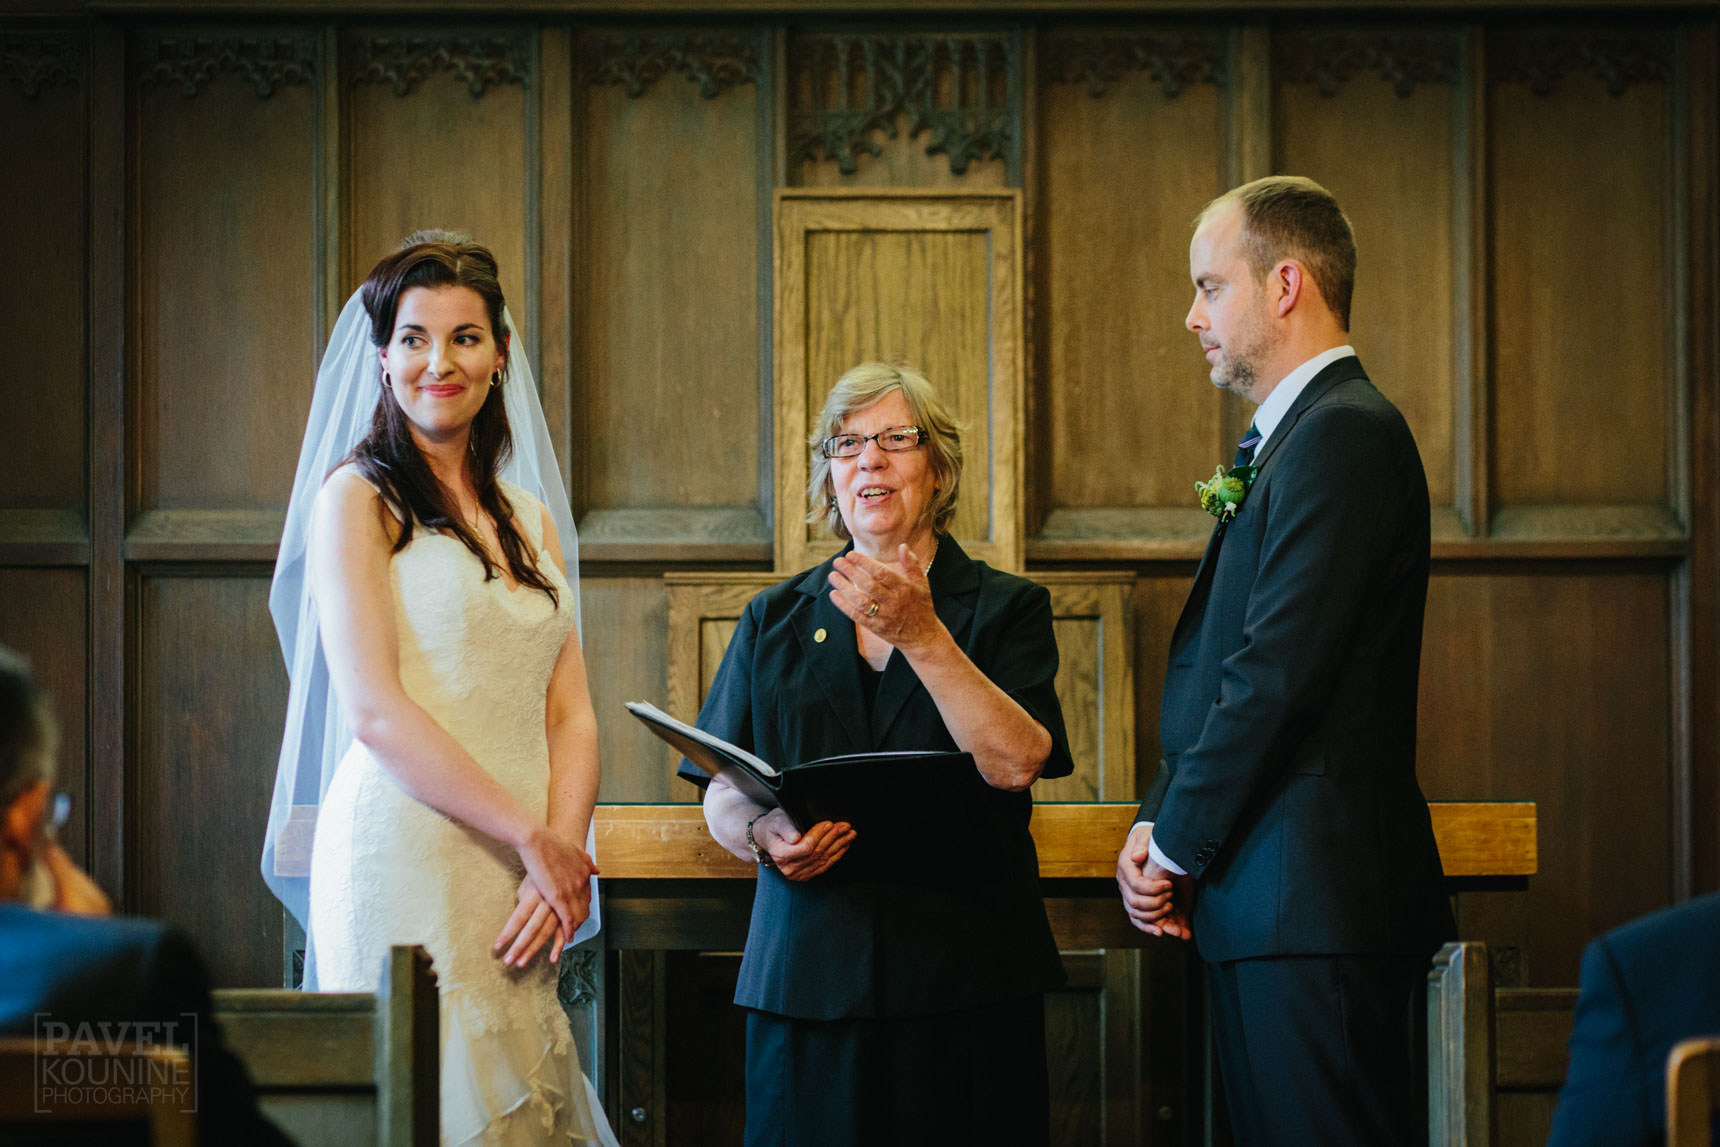 unposed wedding photography no posing